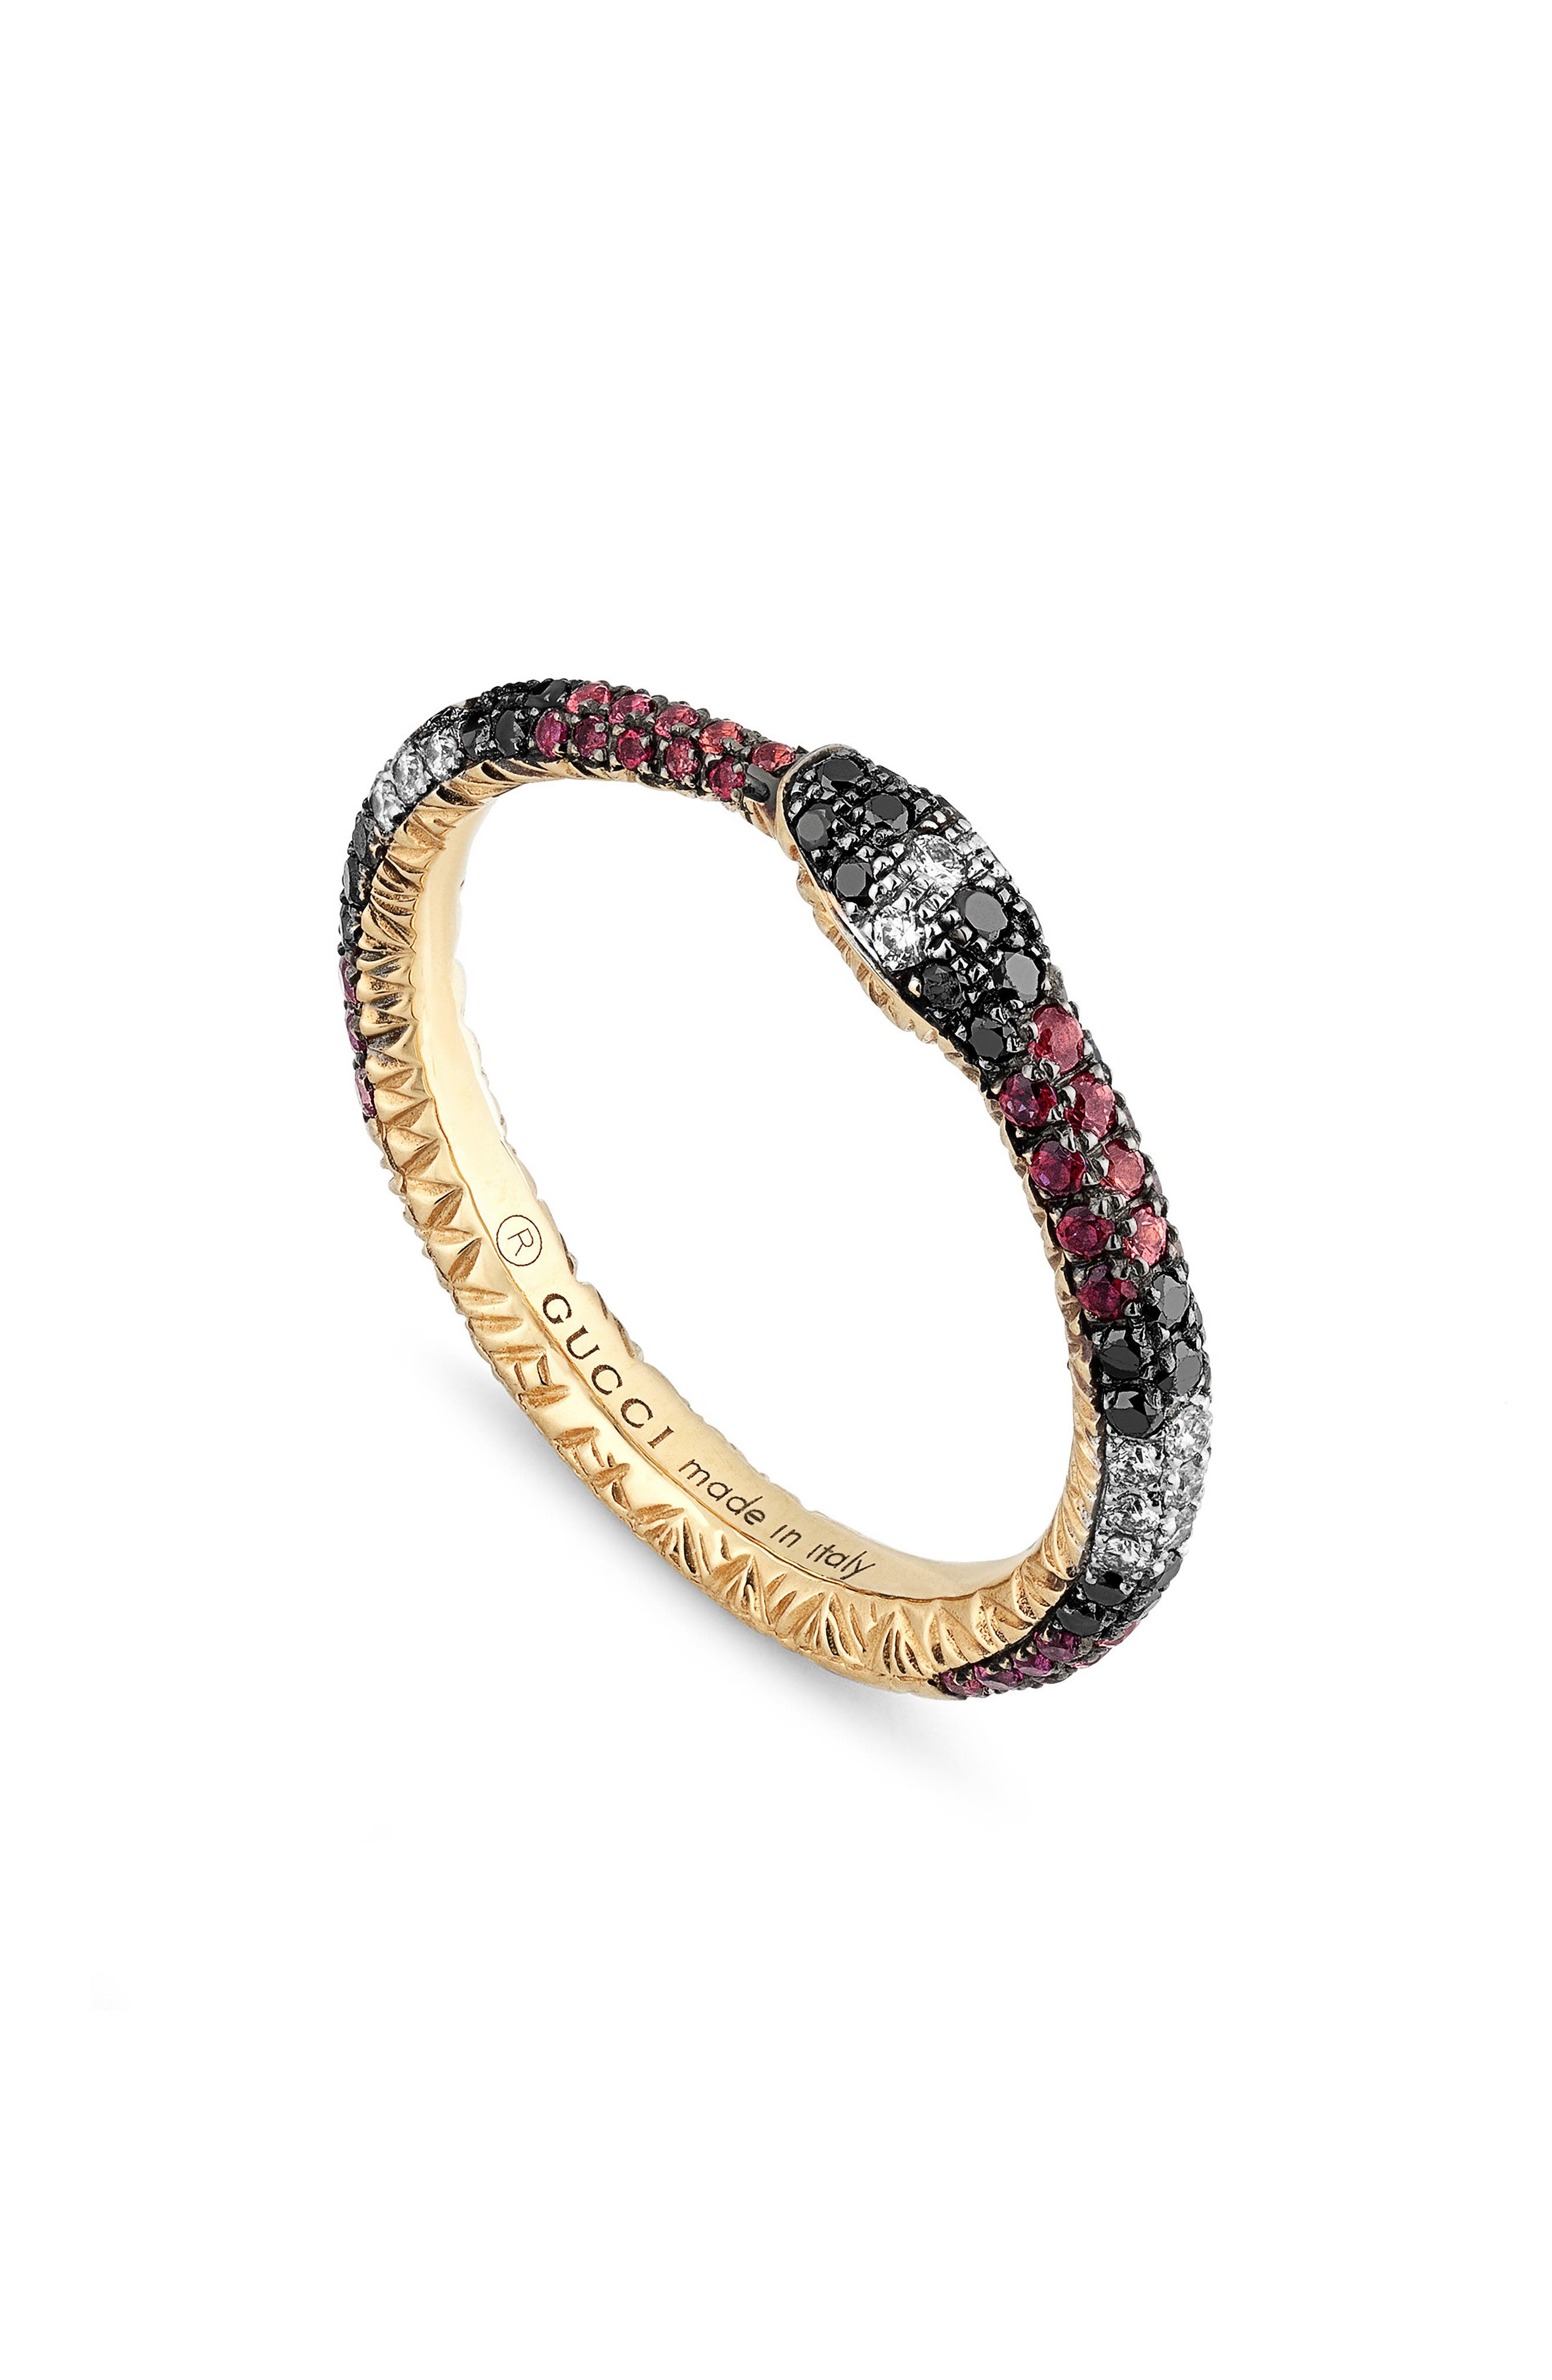 GUCCI,                             Ouroboros Diamond & Stone Pavé Snake Ring,                             Main thumbnail 1, color,                             TOPAZ/ SAPPHIRE/ BLACK DIAMOND